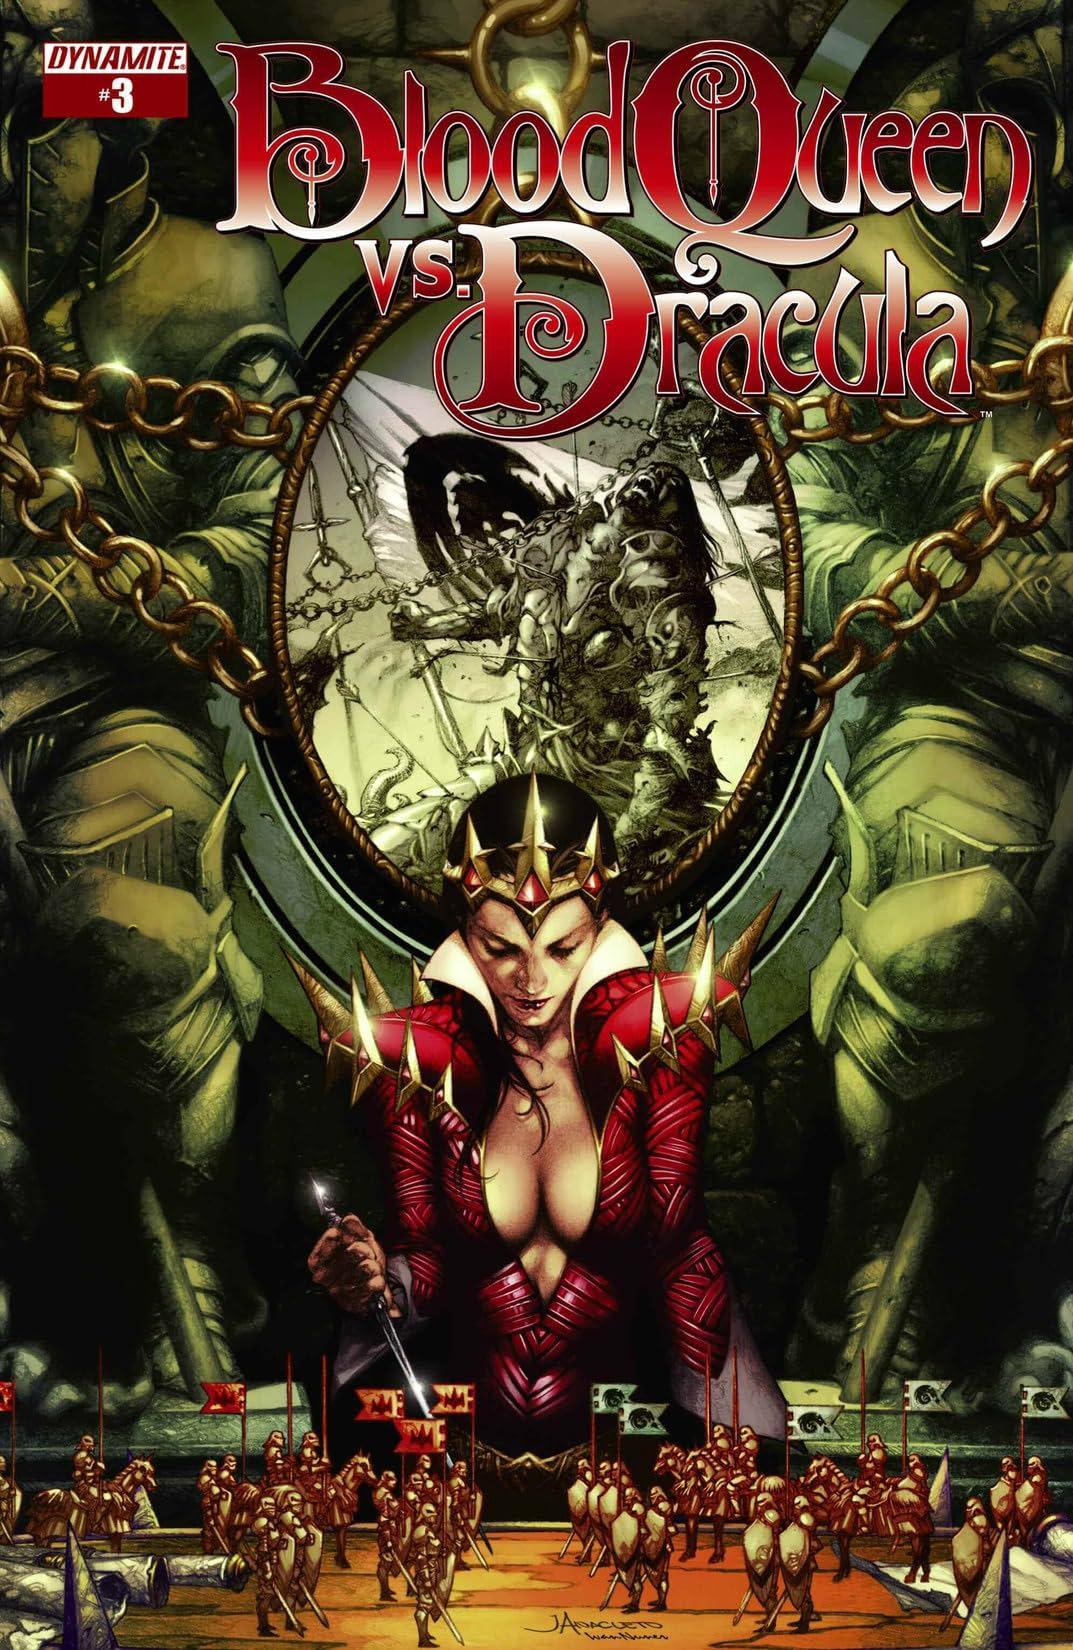 Blood Queen vs. Dracula #3 (of 4): Digital Exclusive Edition